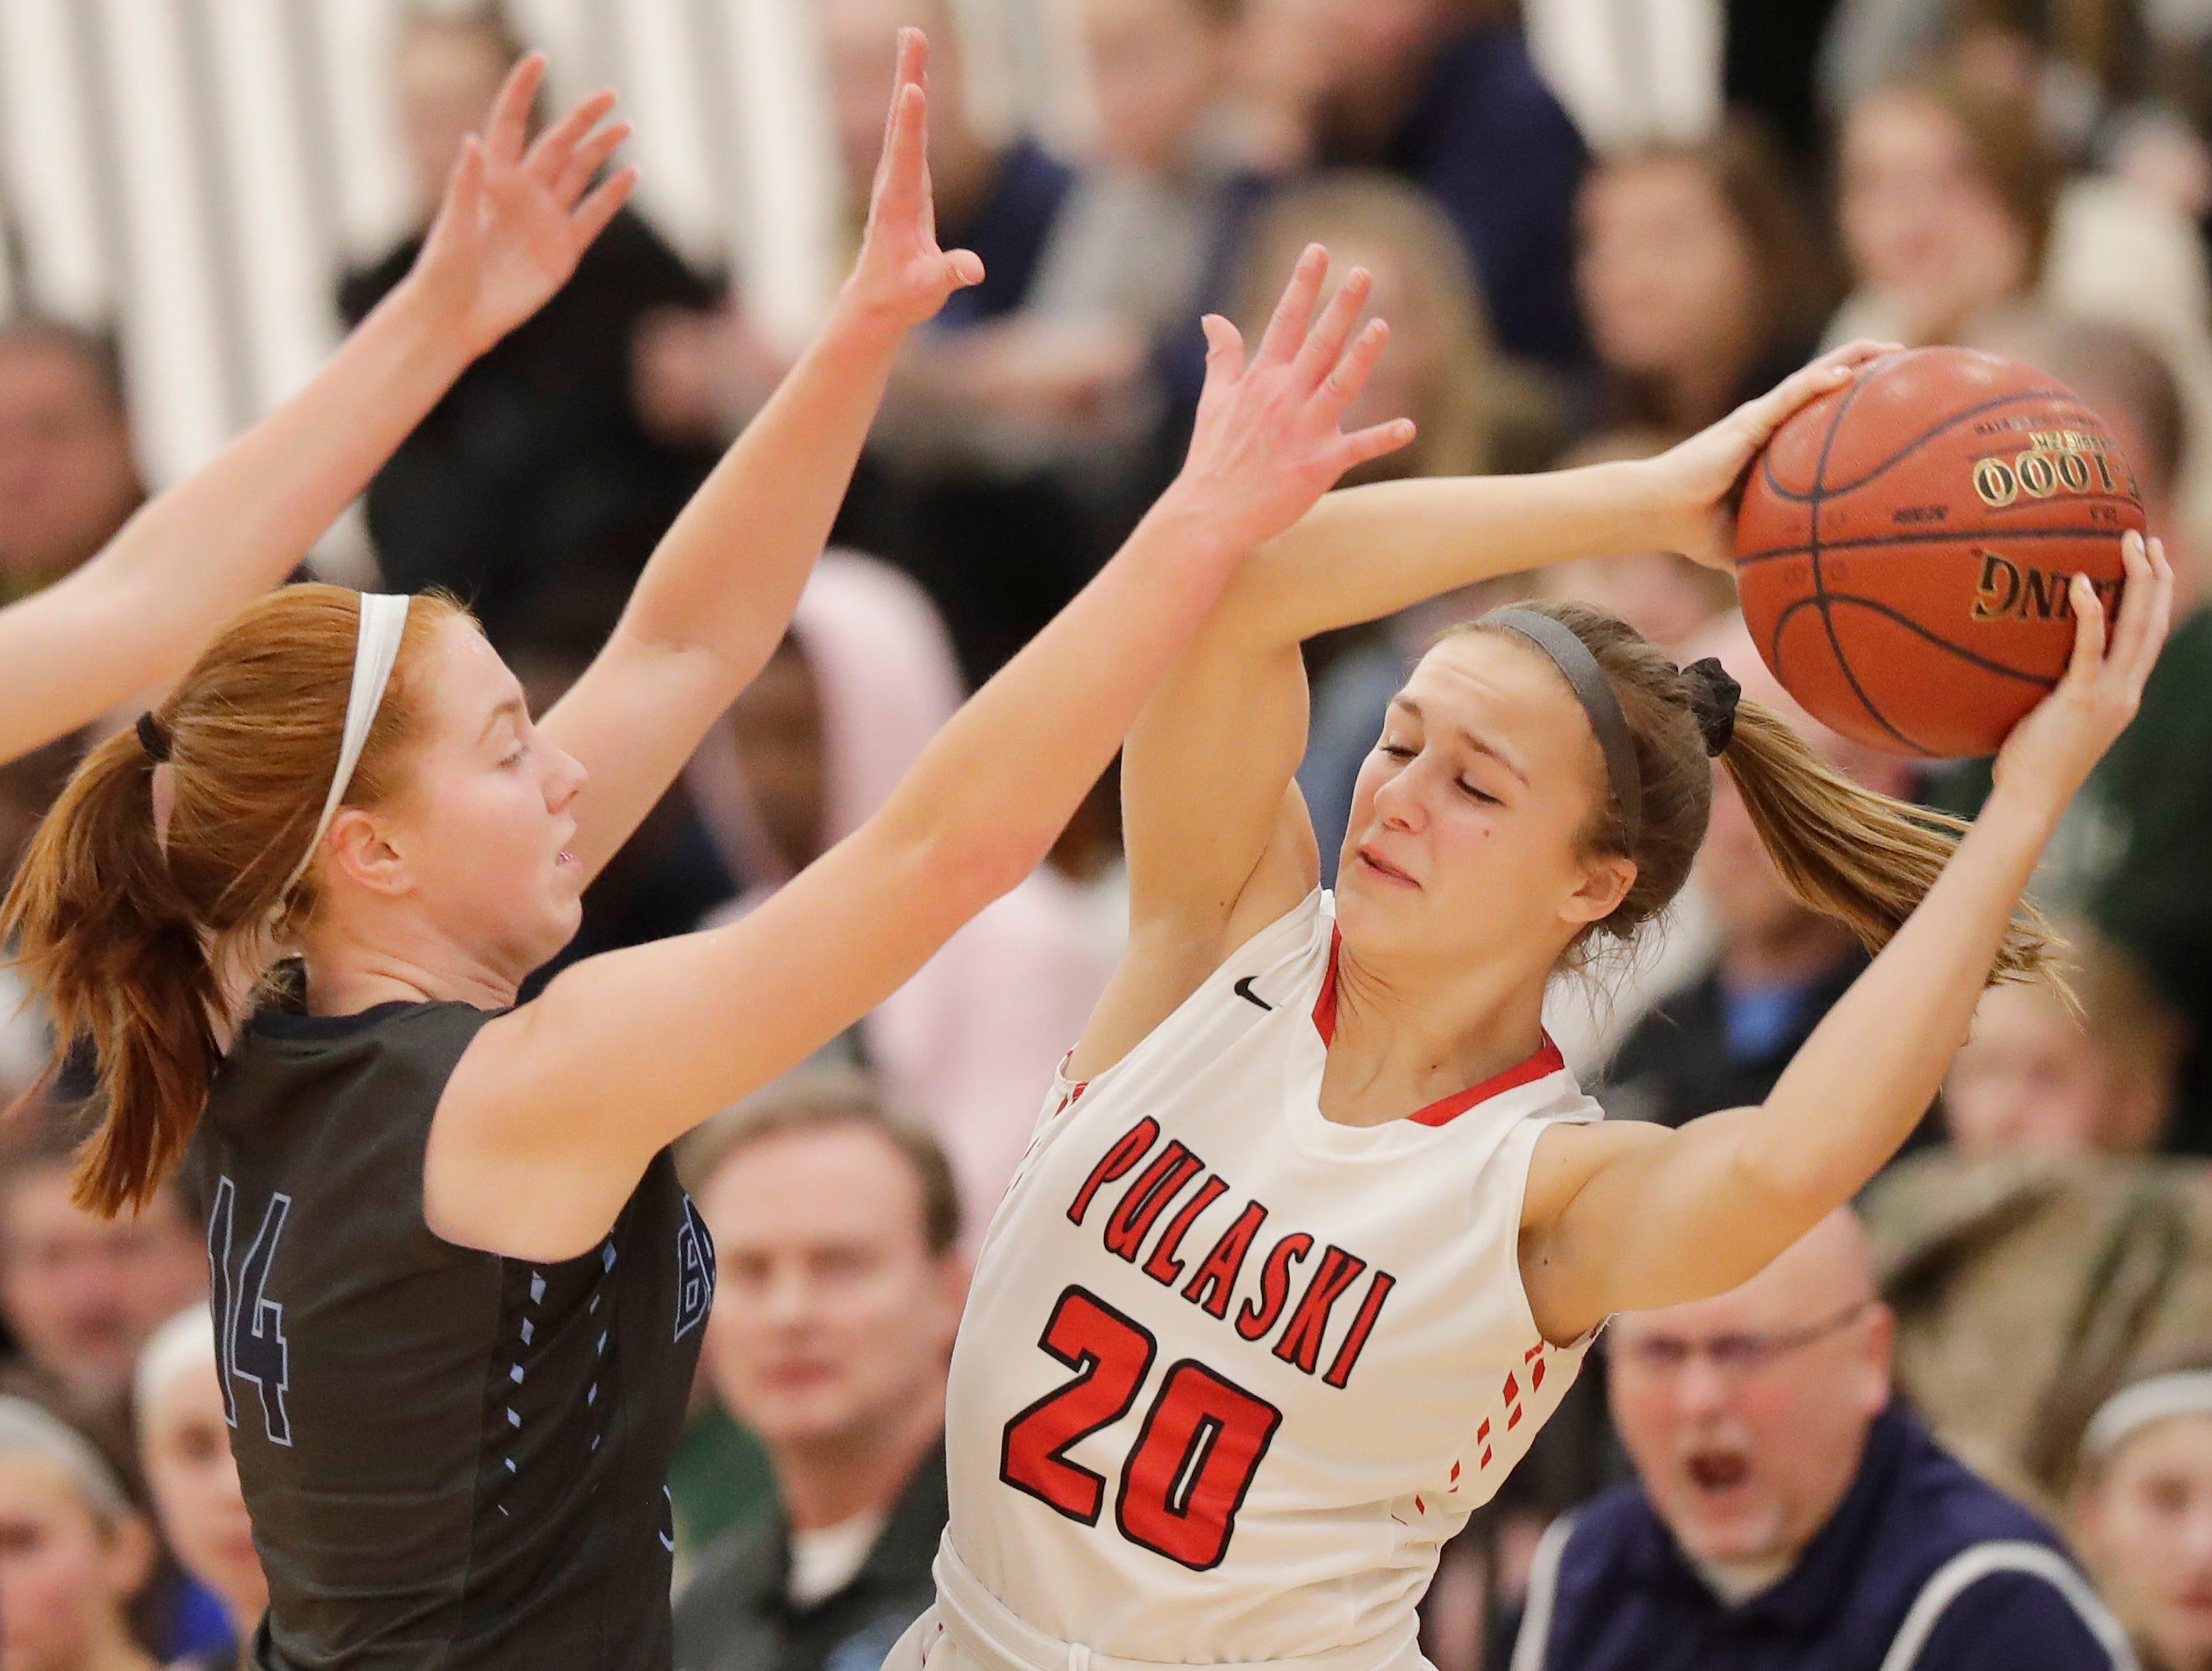 Pulaski's Ashlyn Szymanski (20) is pressured by Alaina Abel (14) in a girls basketball game at Pulaski high school on Friday, January 4, 2019 in Pulaski, Wis.